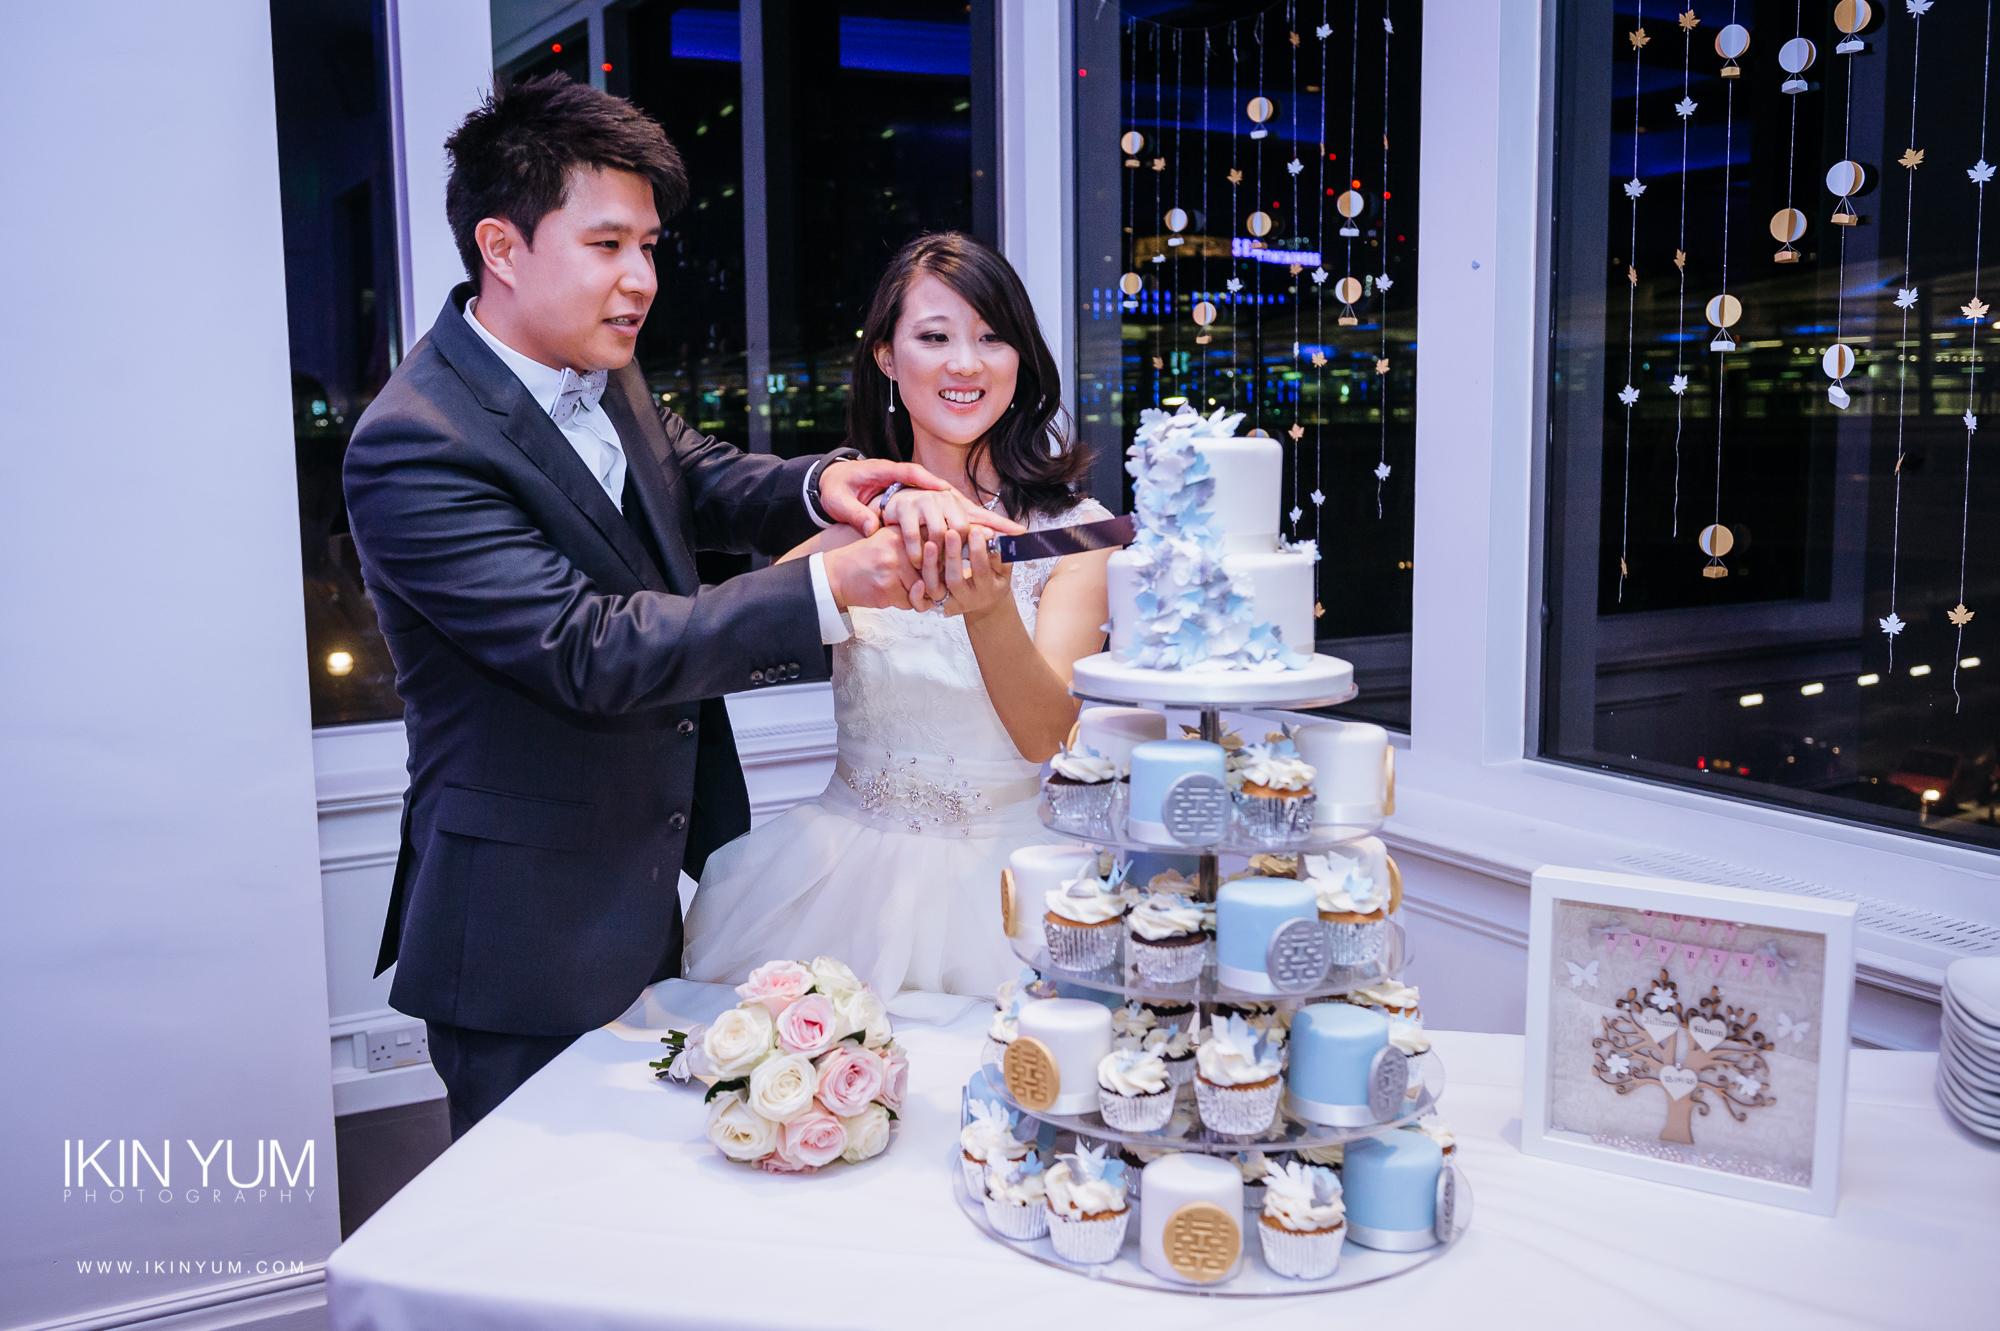 Mermaid river rooms Wedding - Ikin Yum Photography-100.jpg